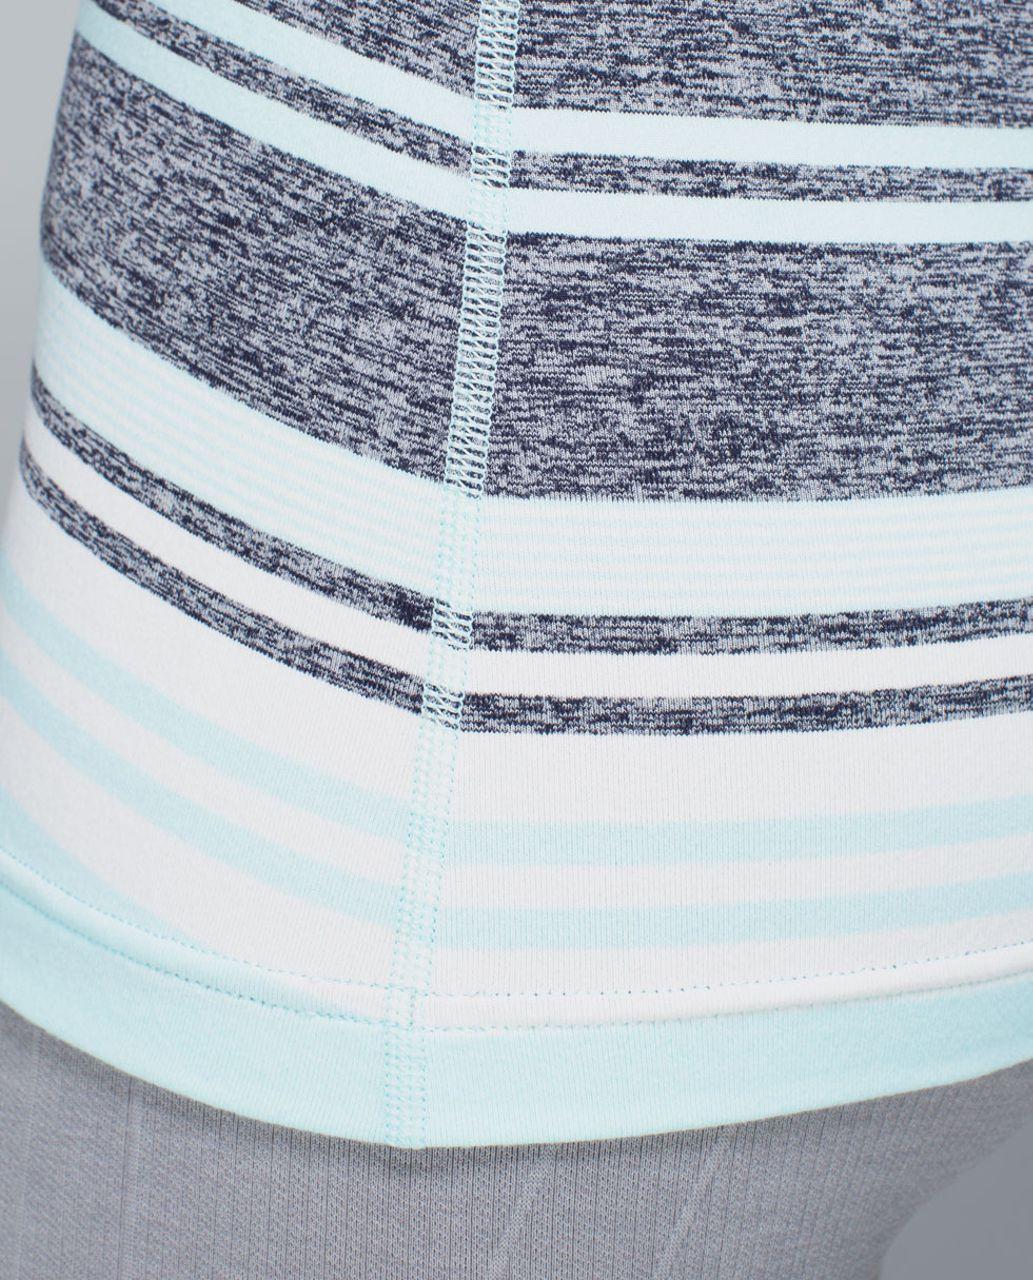 Lululemon Cool Racerback - Groovy Stripe Static Wave Cadet Blue